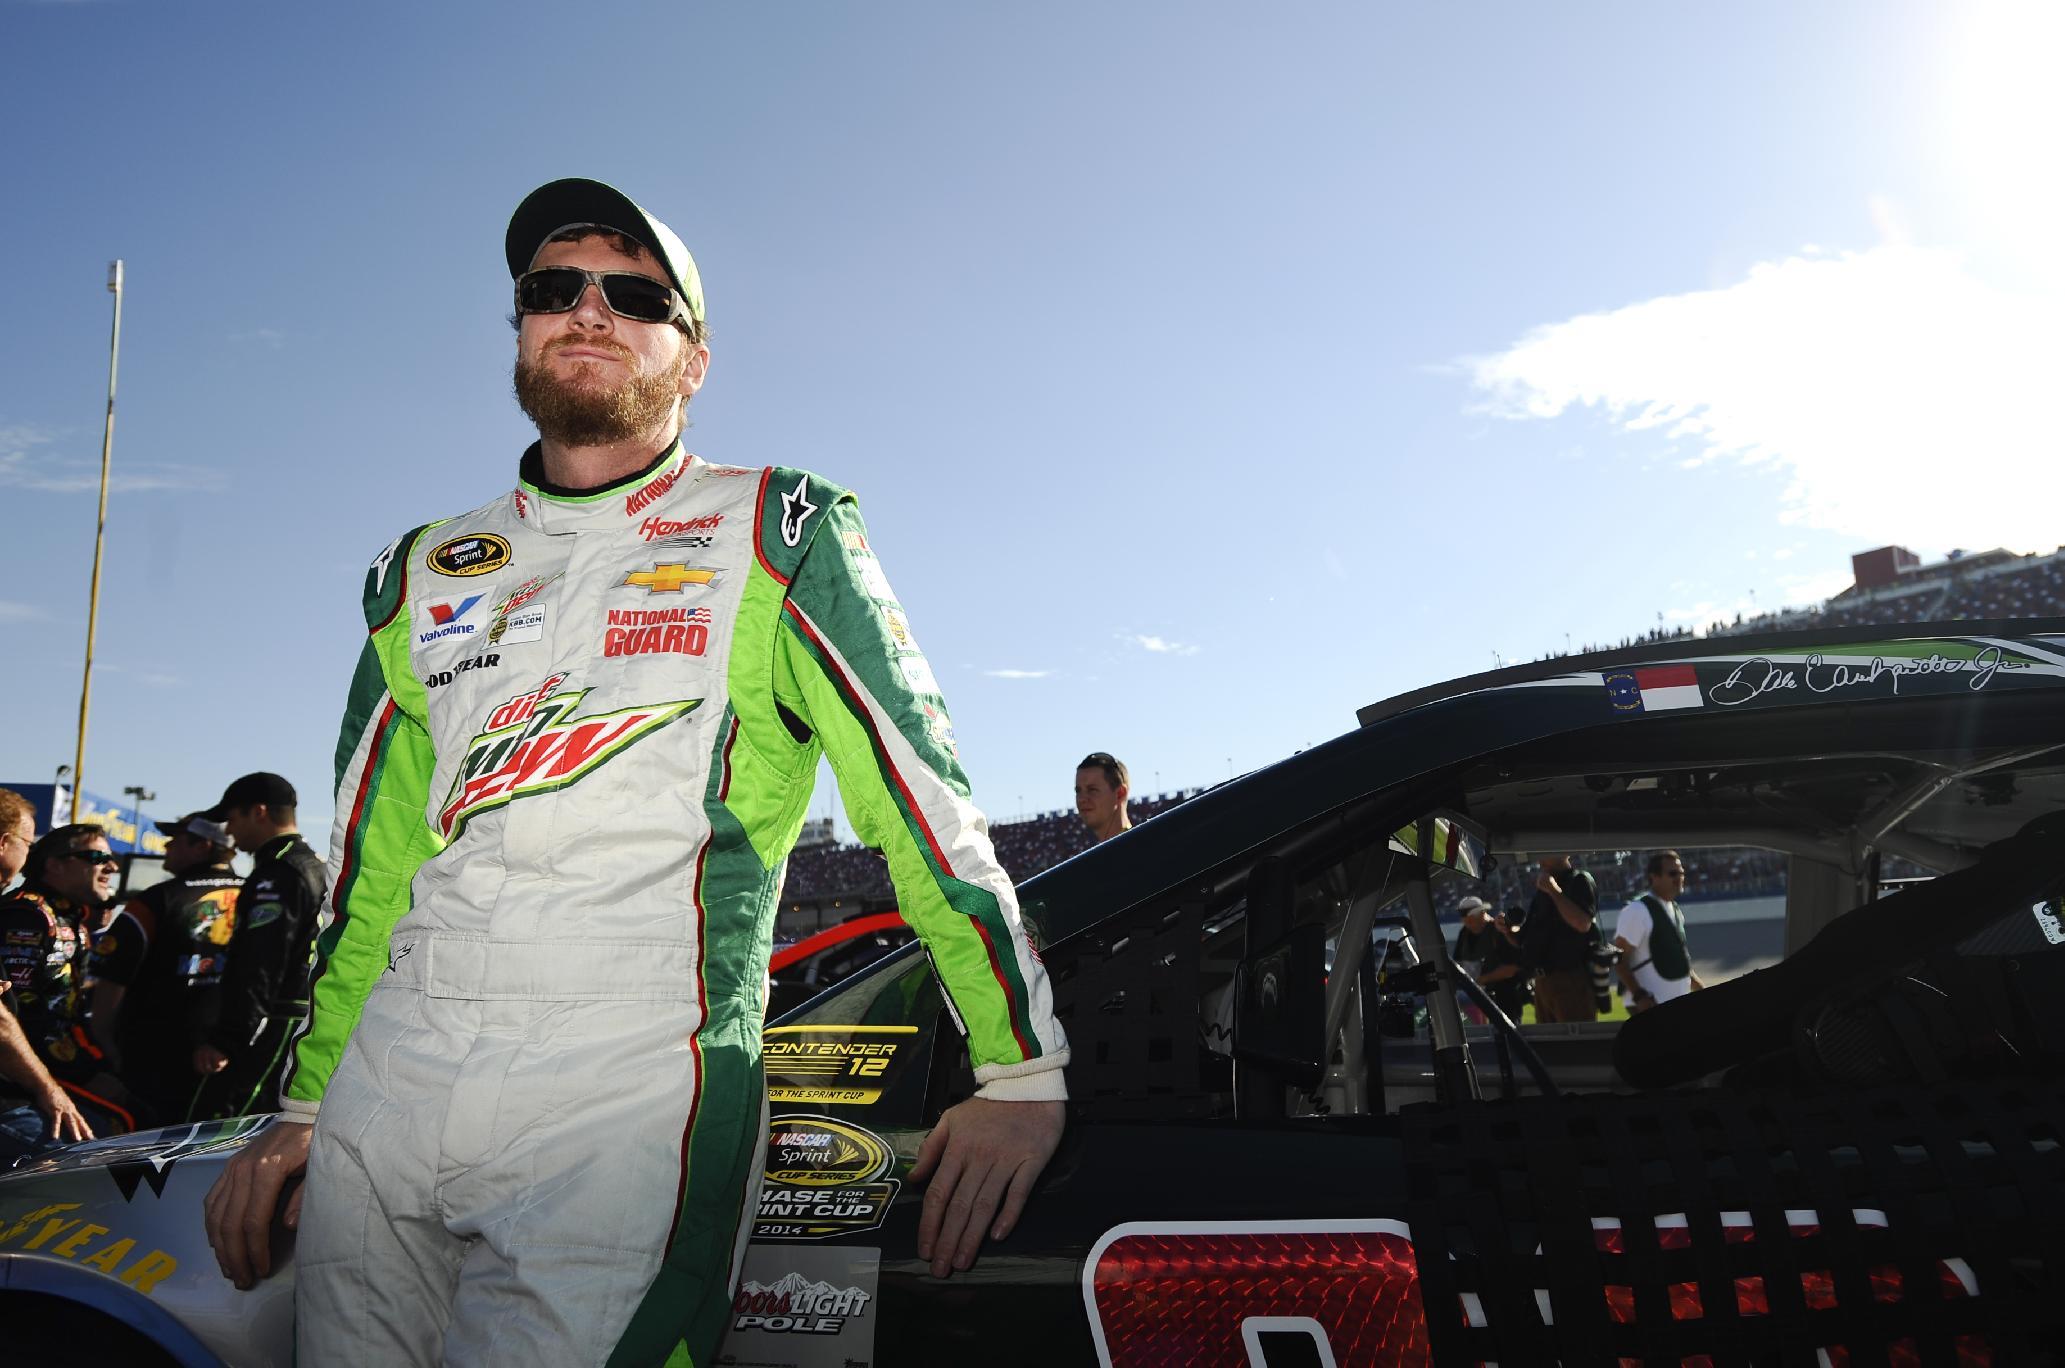 Dale Earnhardt Jr., waits  to qualify for Sunday's  NASCAR Sprint Cup Series auto race at Talladega Superspeedway Saturday, Oct. 18, 2014, in Talladega, Ala.  (AP Photo/Rainier Ehrhardt)